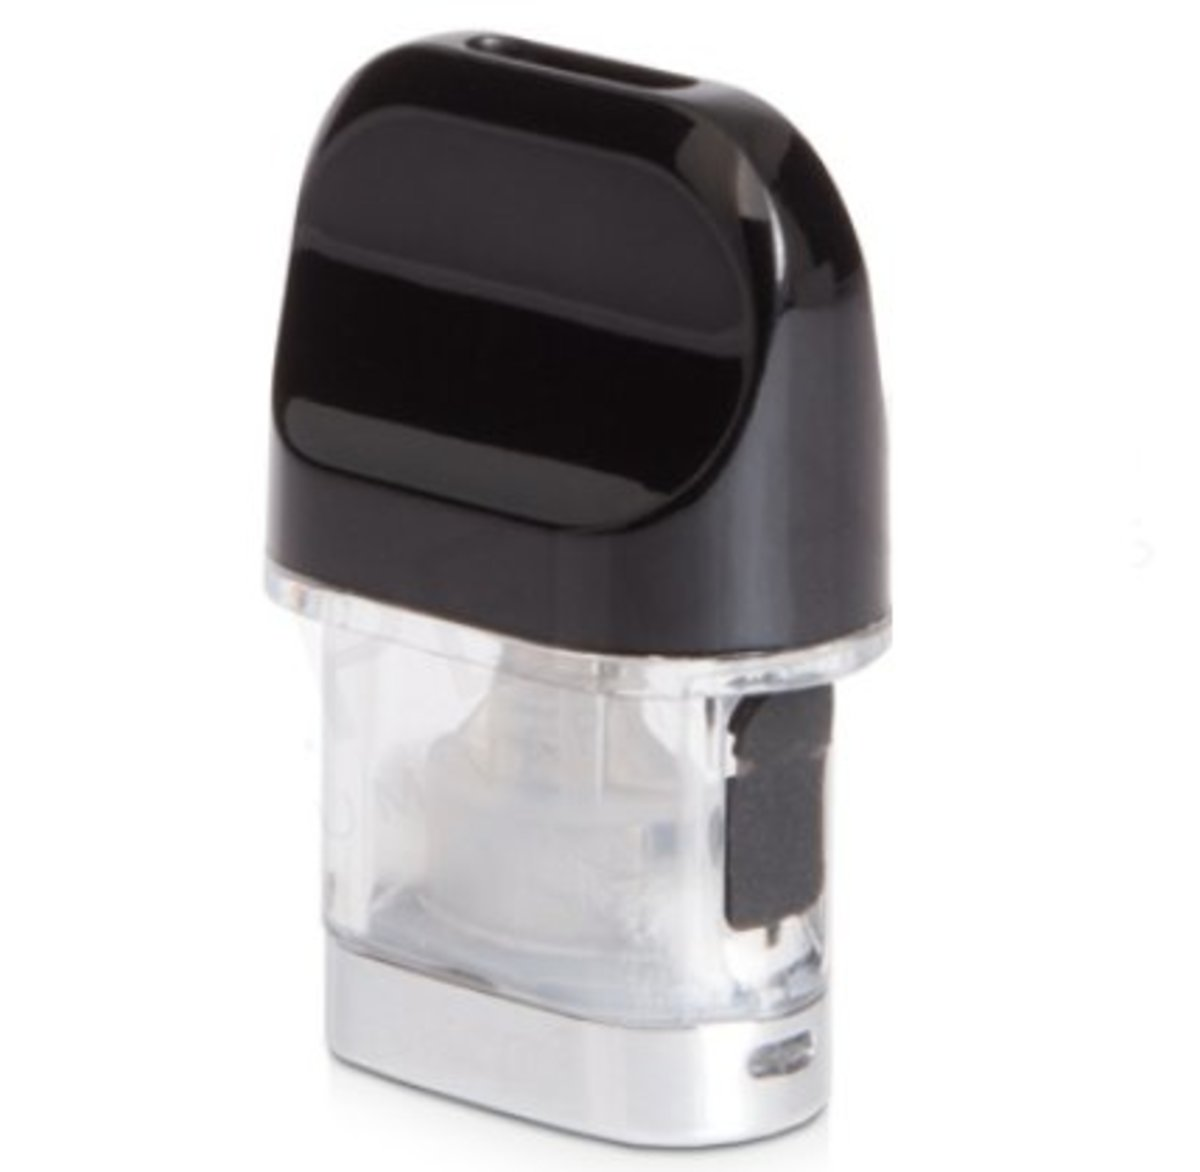 SMOK Novo Pods 0 8 Ohm Mesh | Electronic Cigarette Co